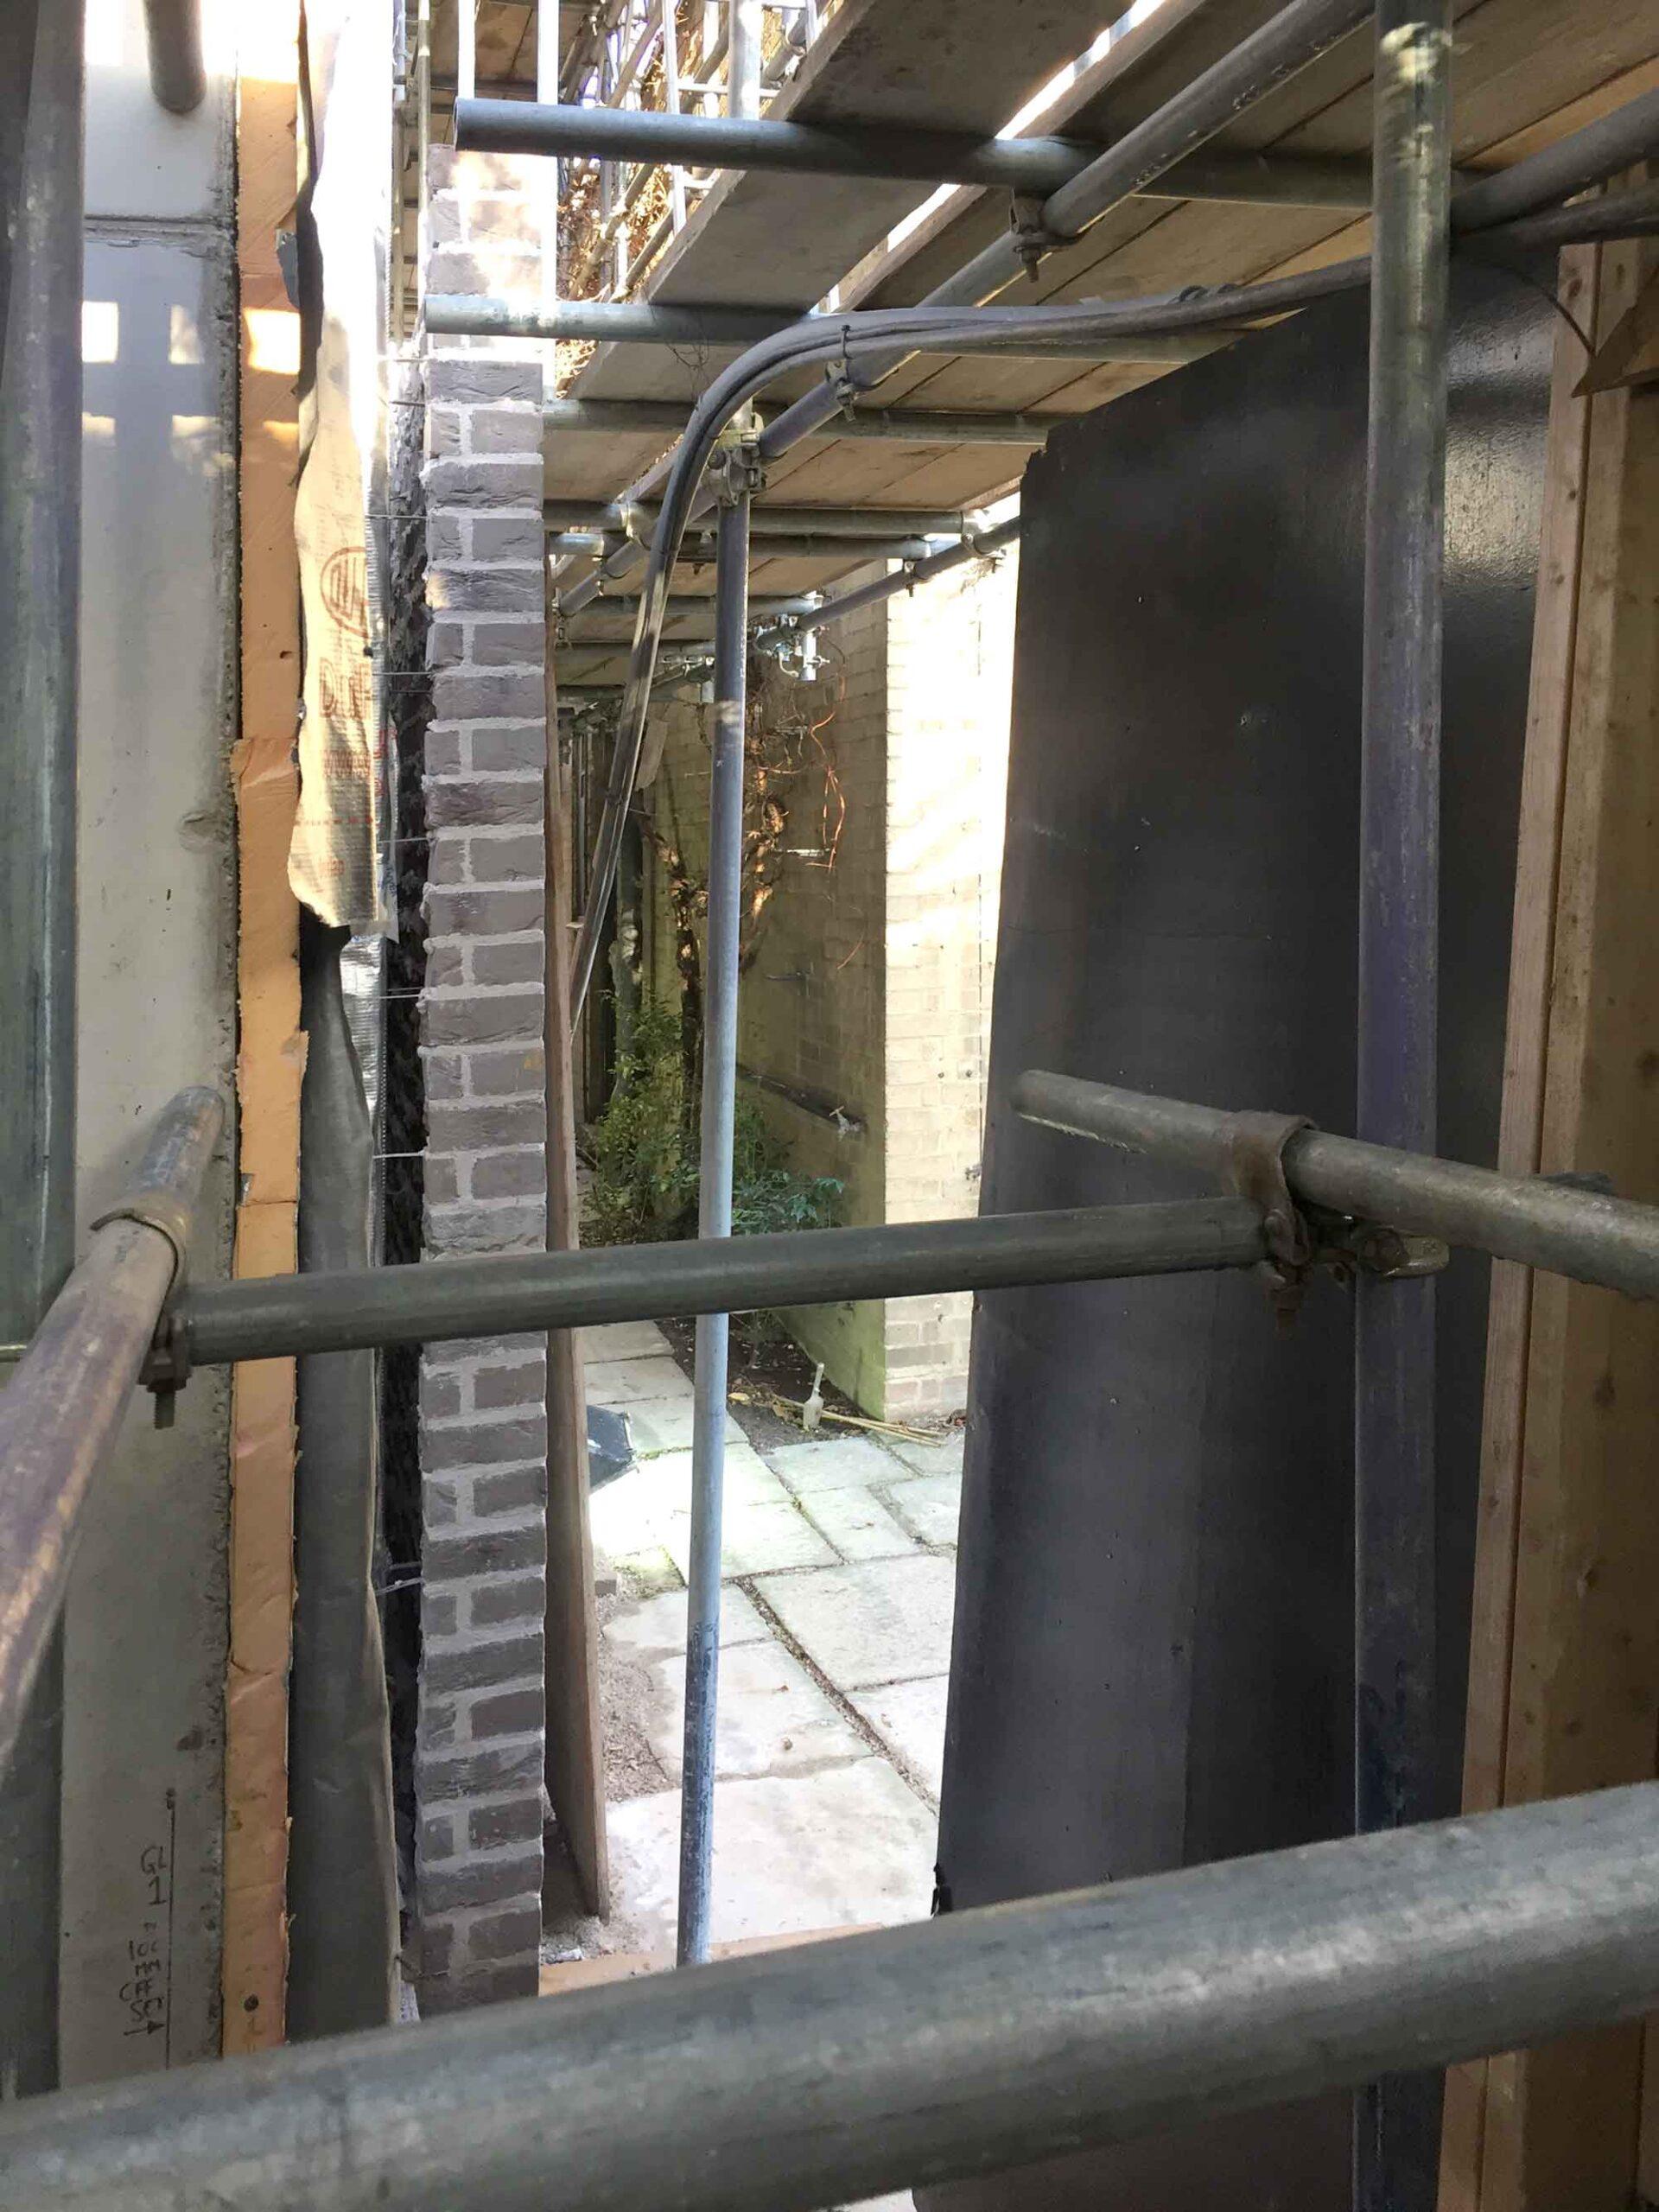 kensington-house-openstudio-architects-brick-wall